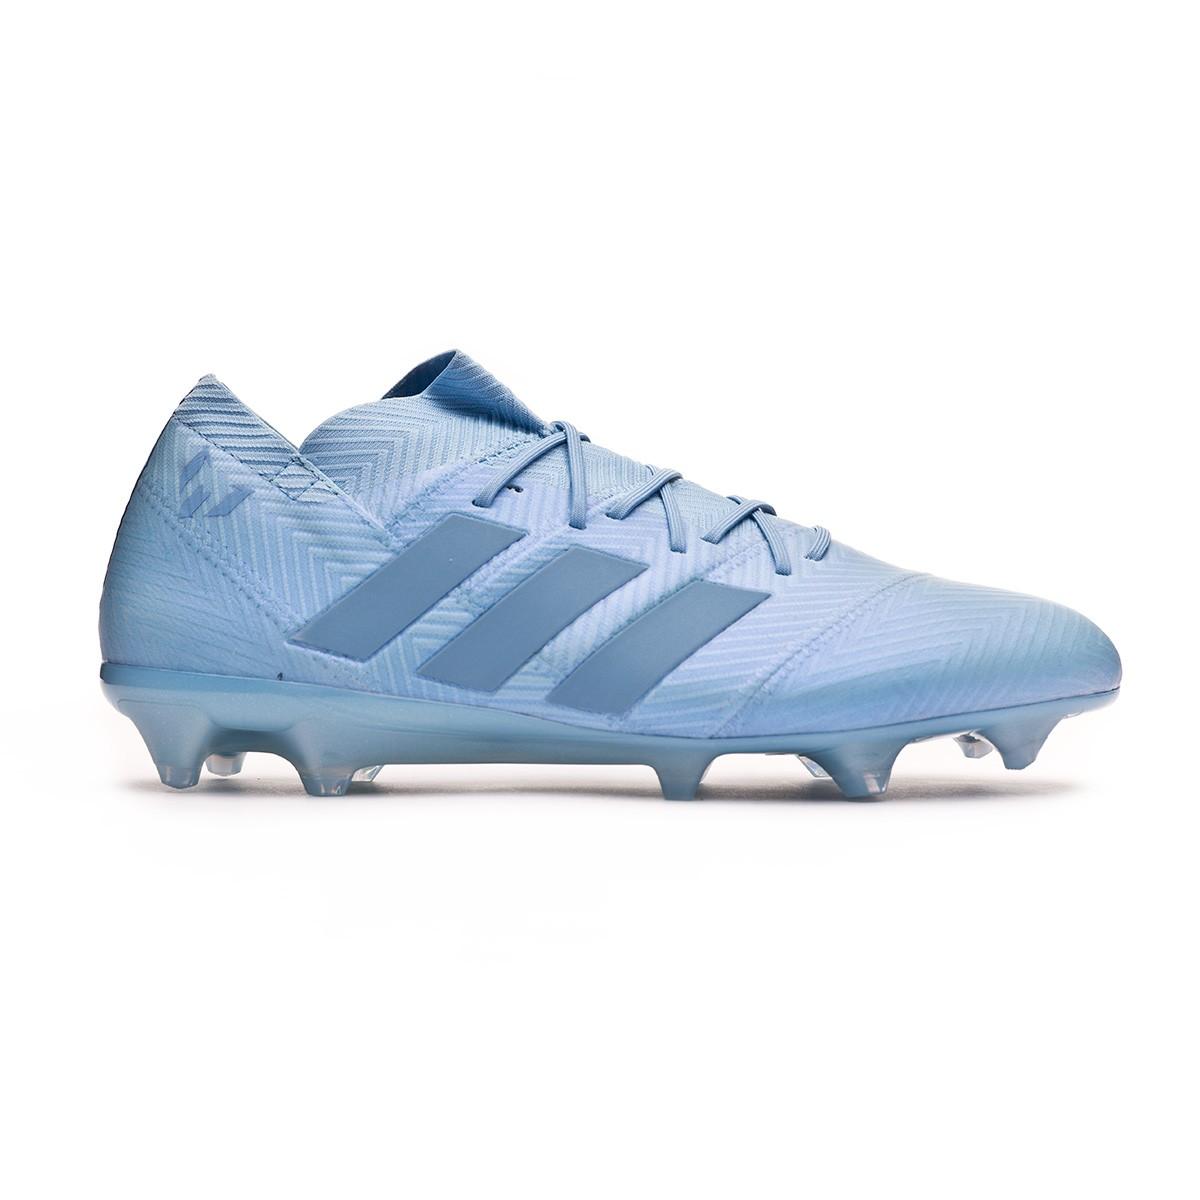 Tacchetti da Calcio Adidas Nemeziz Messi 18.1 FG Bianco Blu